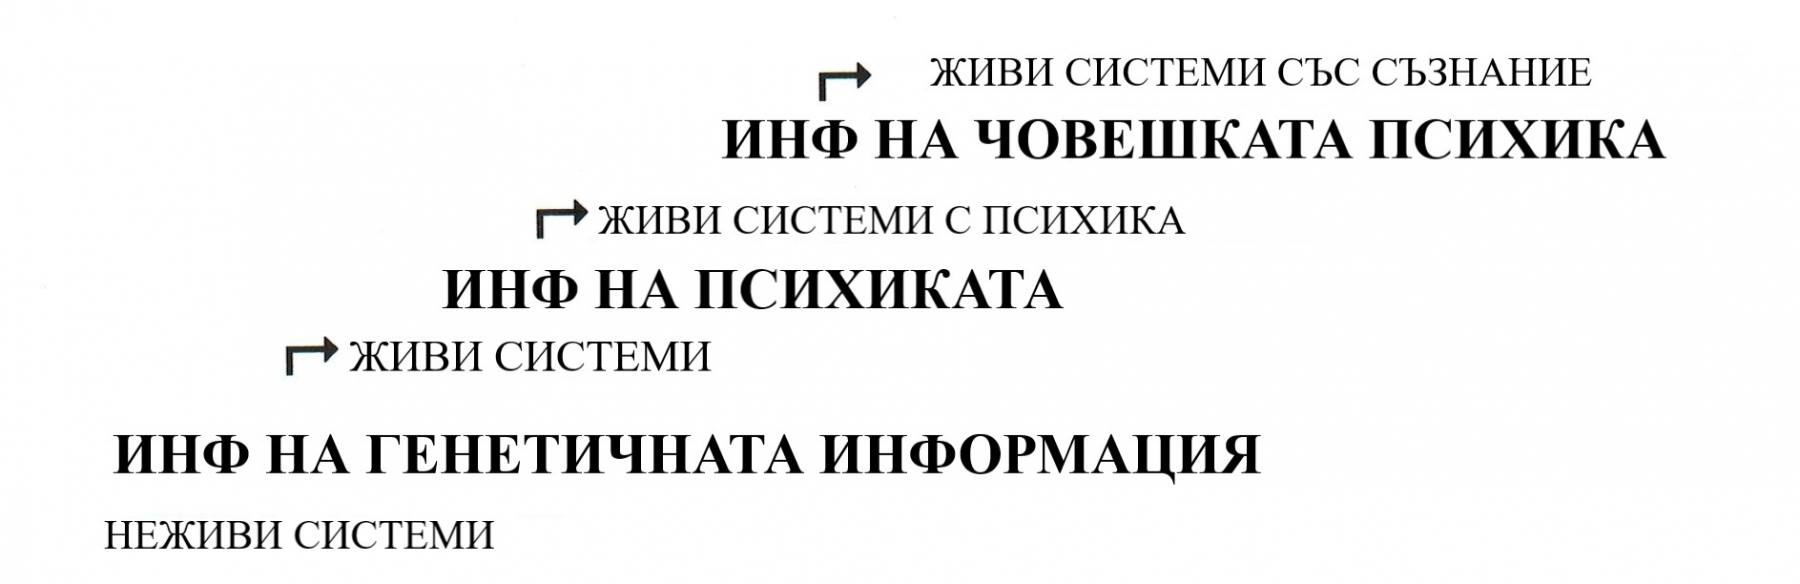 skokove32-001